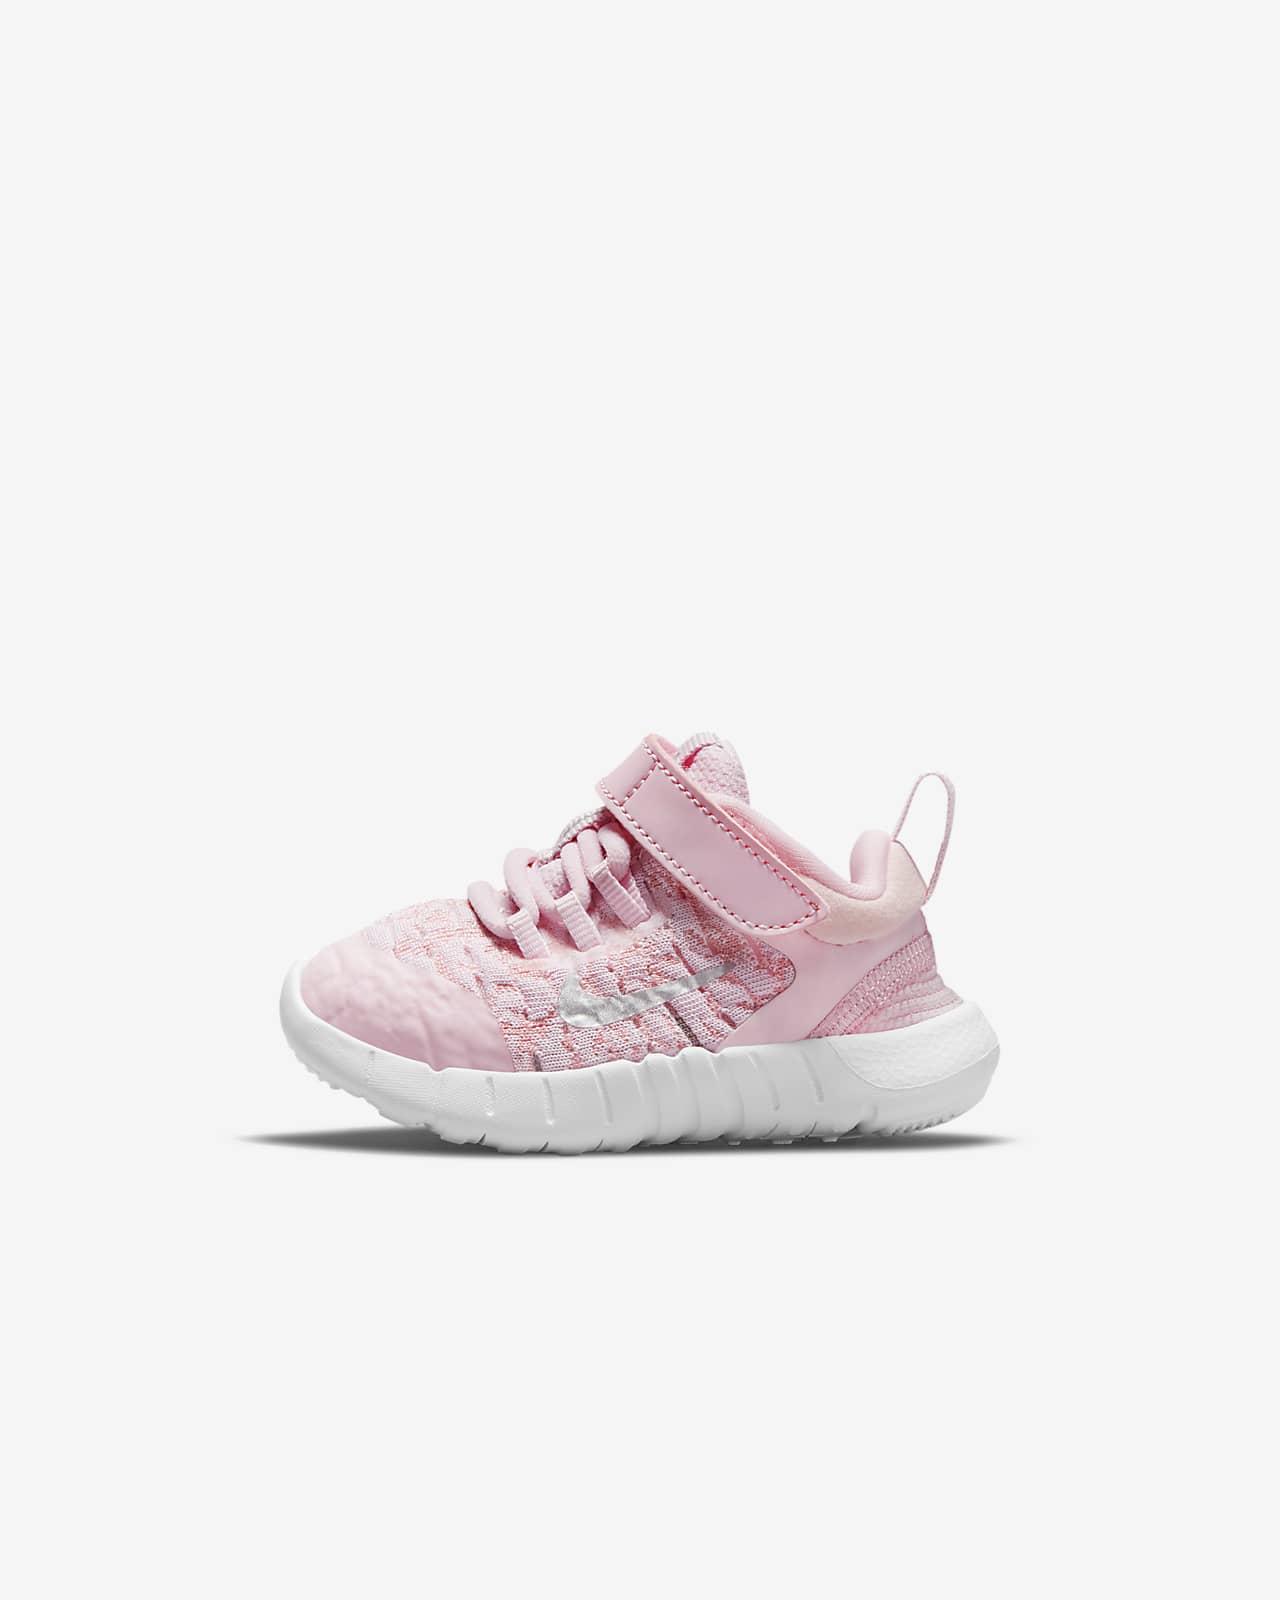 Nike Free RN 2021 Baby/Toddler Shoes